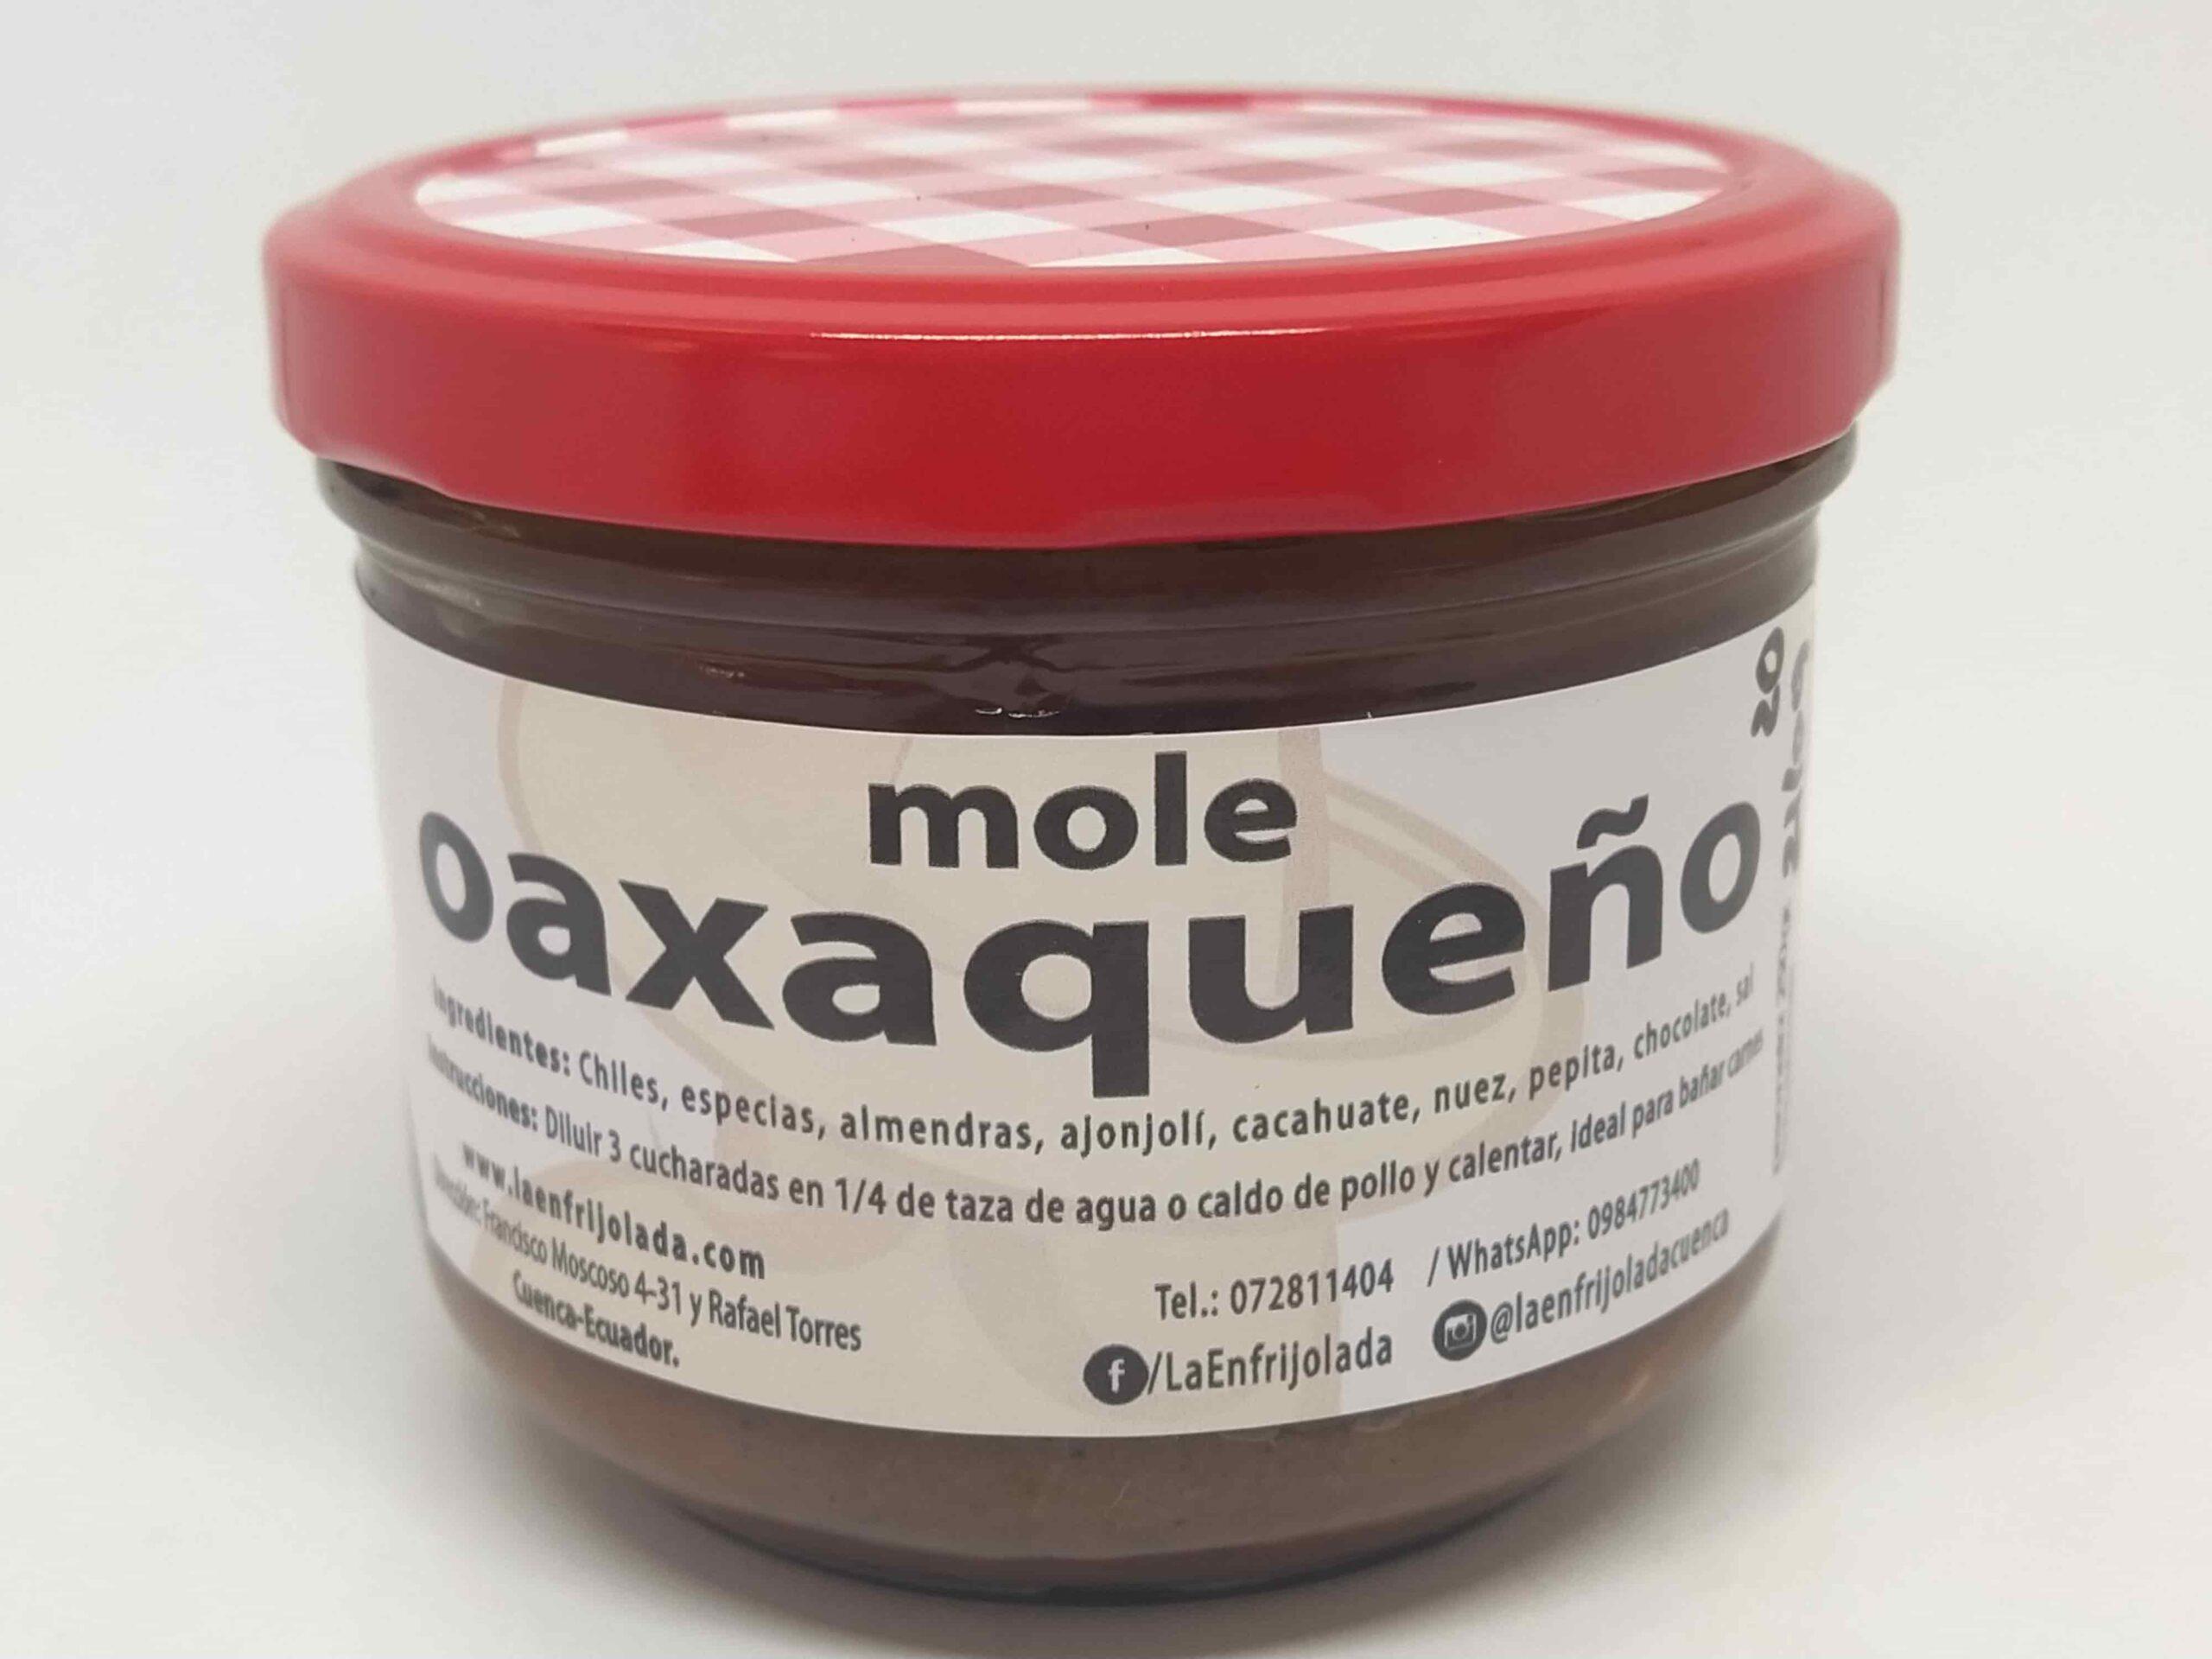 Mole Oaxaqueño